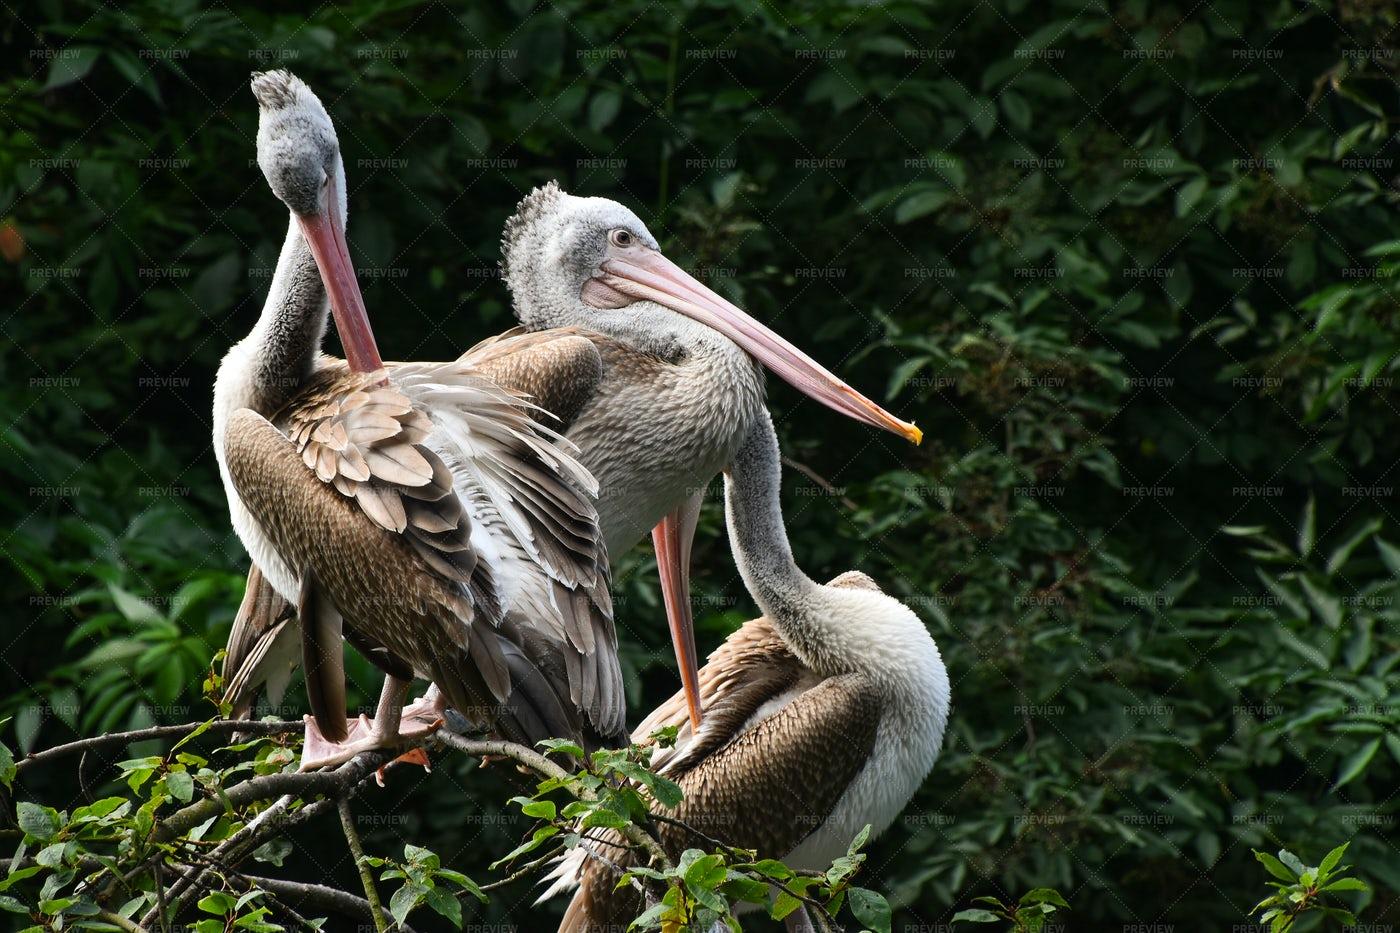 Pelicans Resting On Tree: Stock Photos